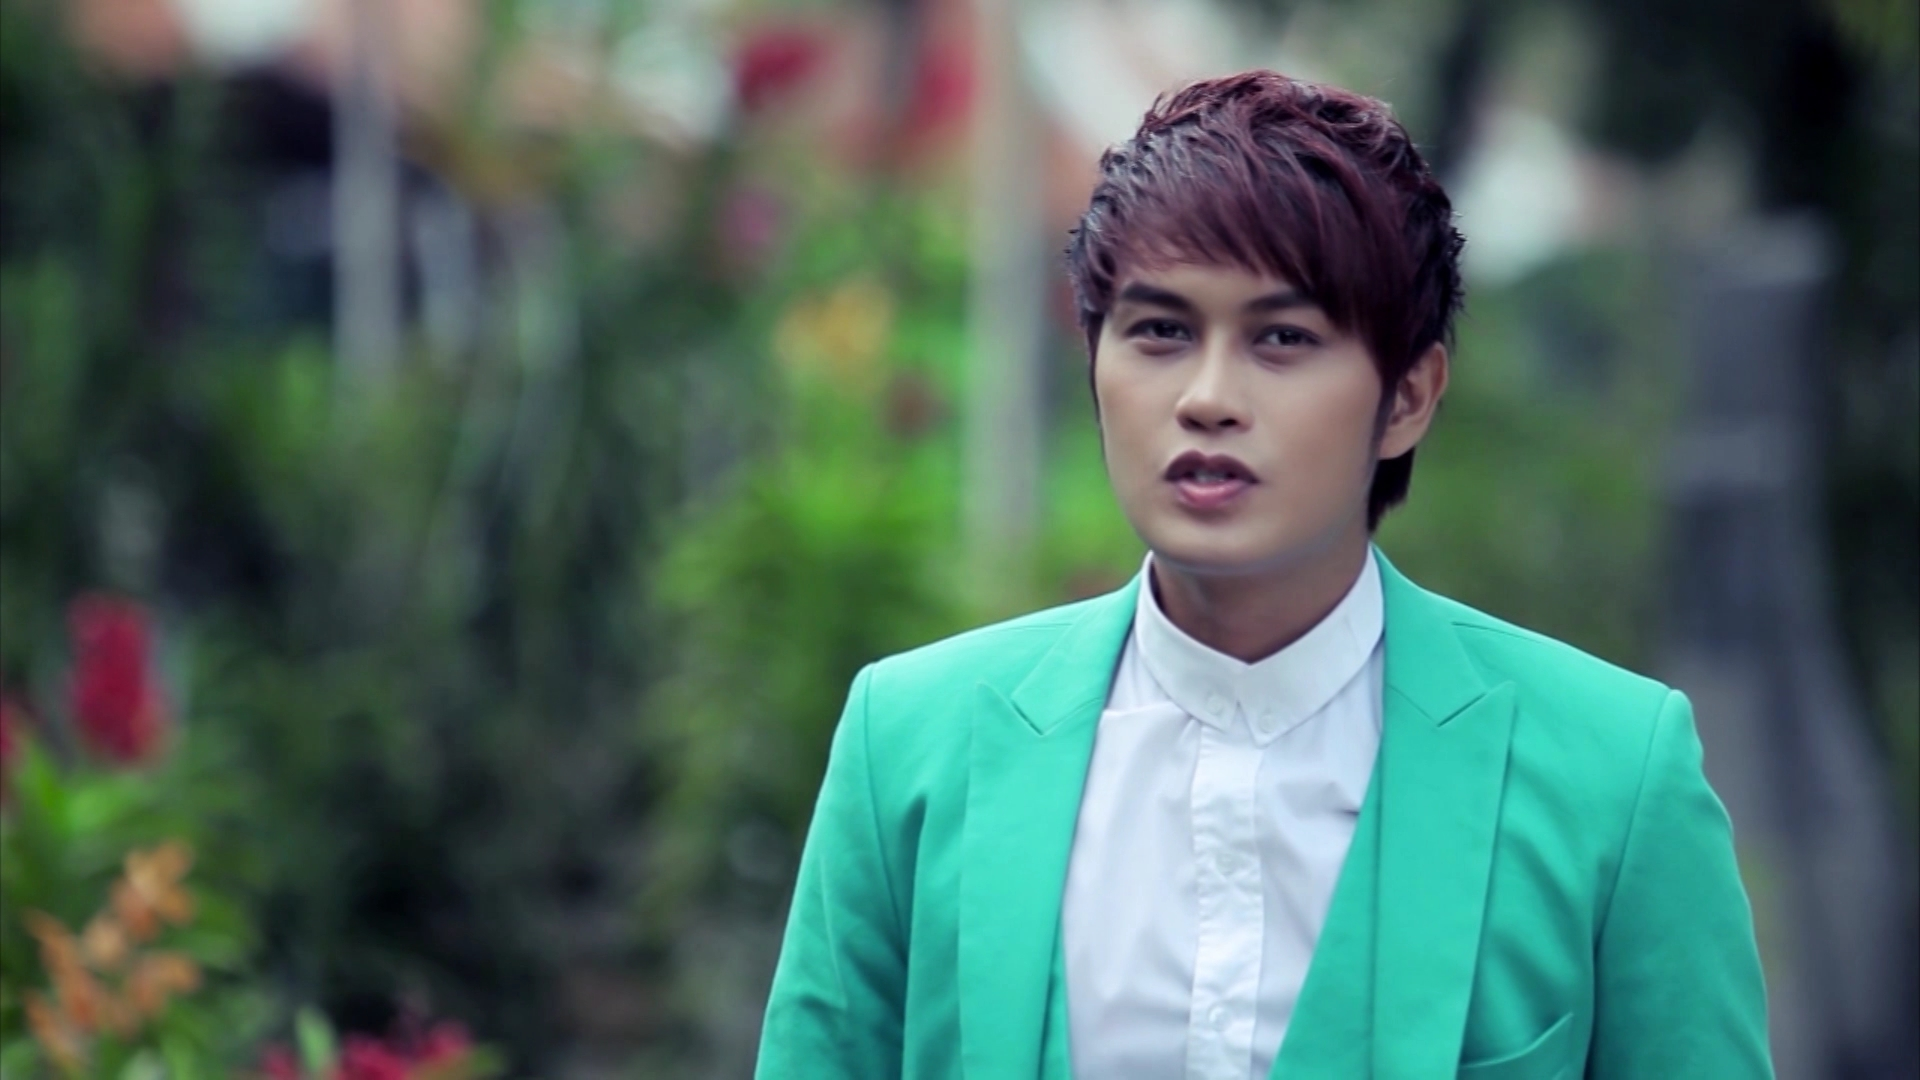 Nhnh Lan Rừng - L Hải Bi ht, lyrics - Zing MP3